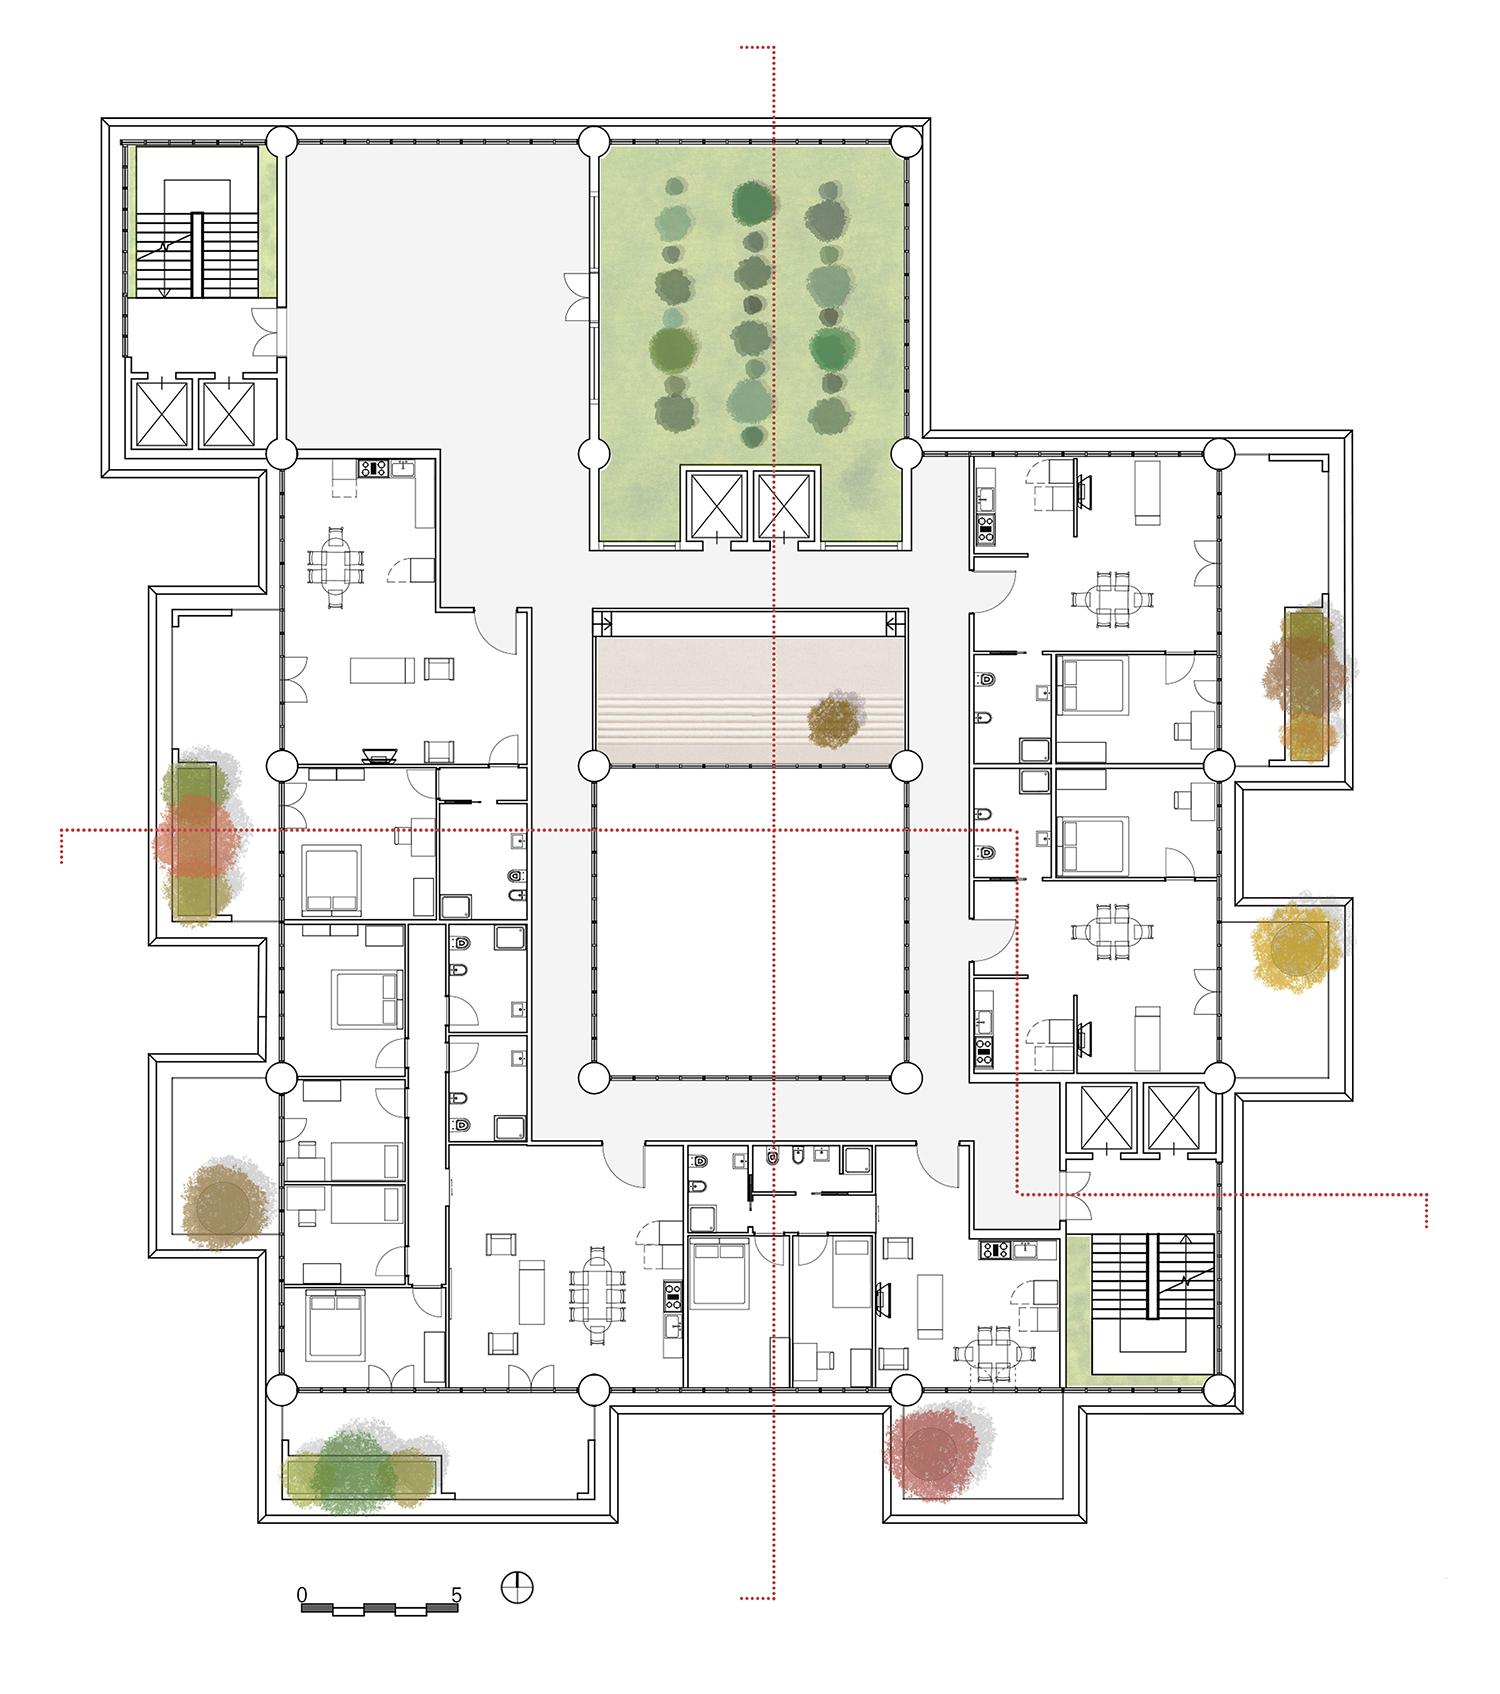 Level 12 | Residential Guglielmo Barberi}